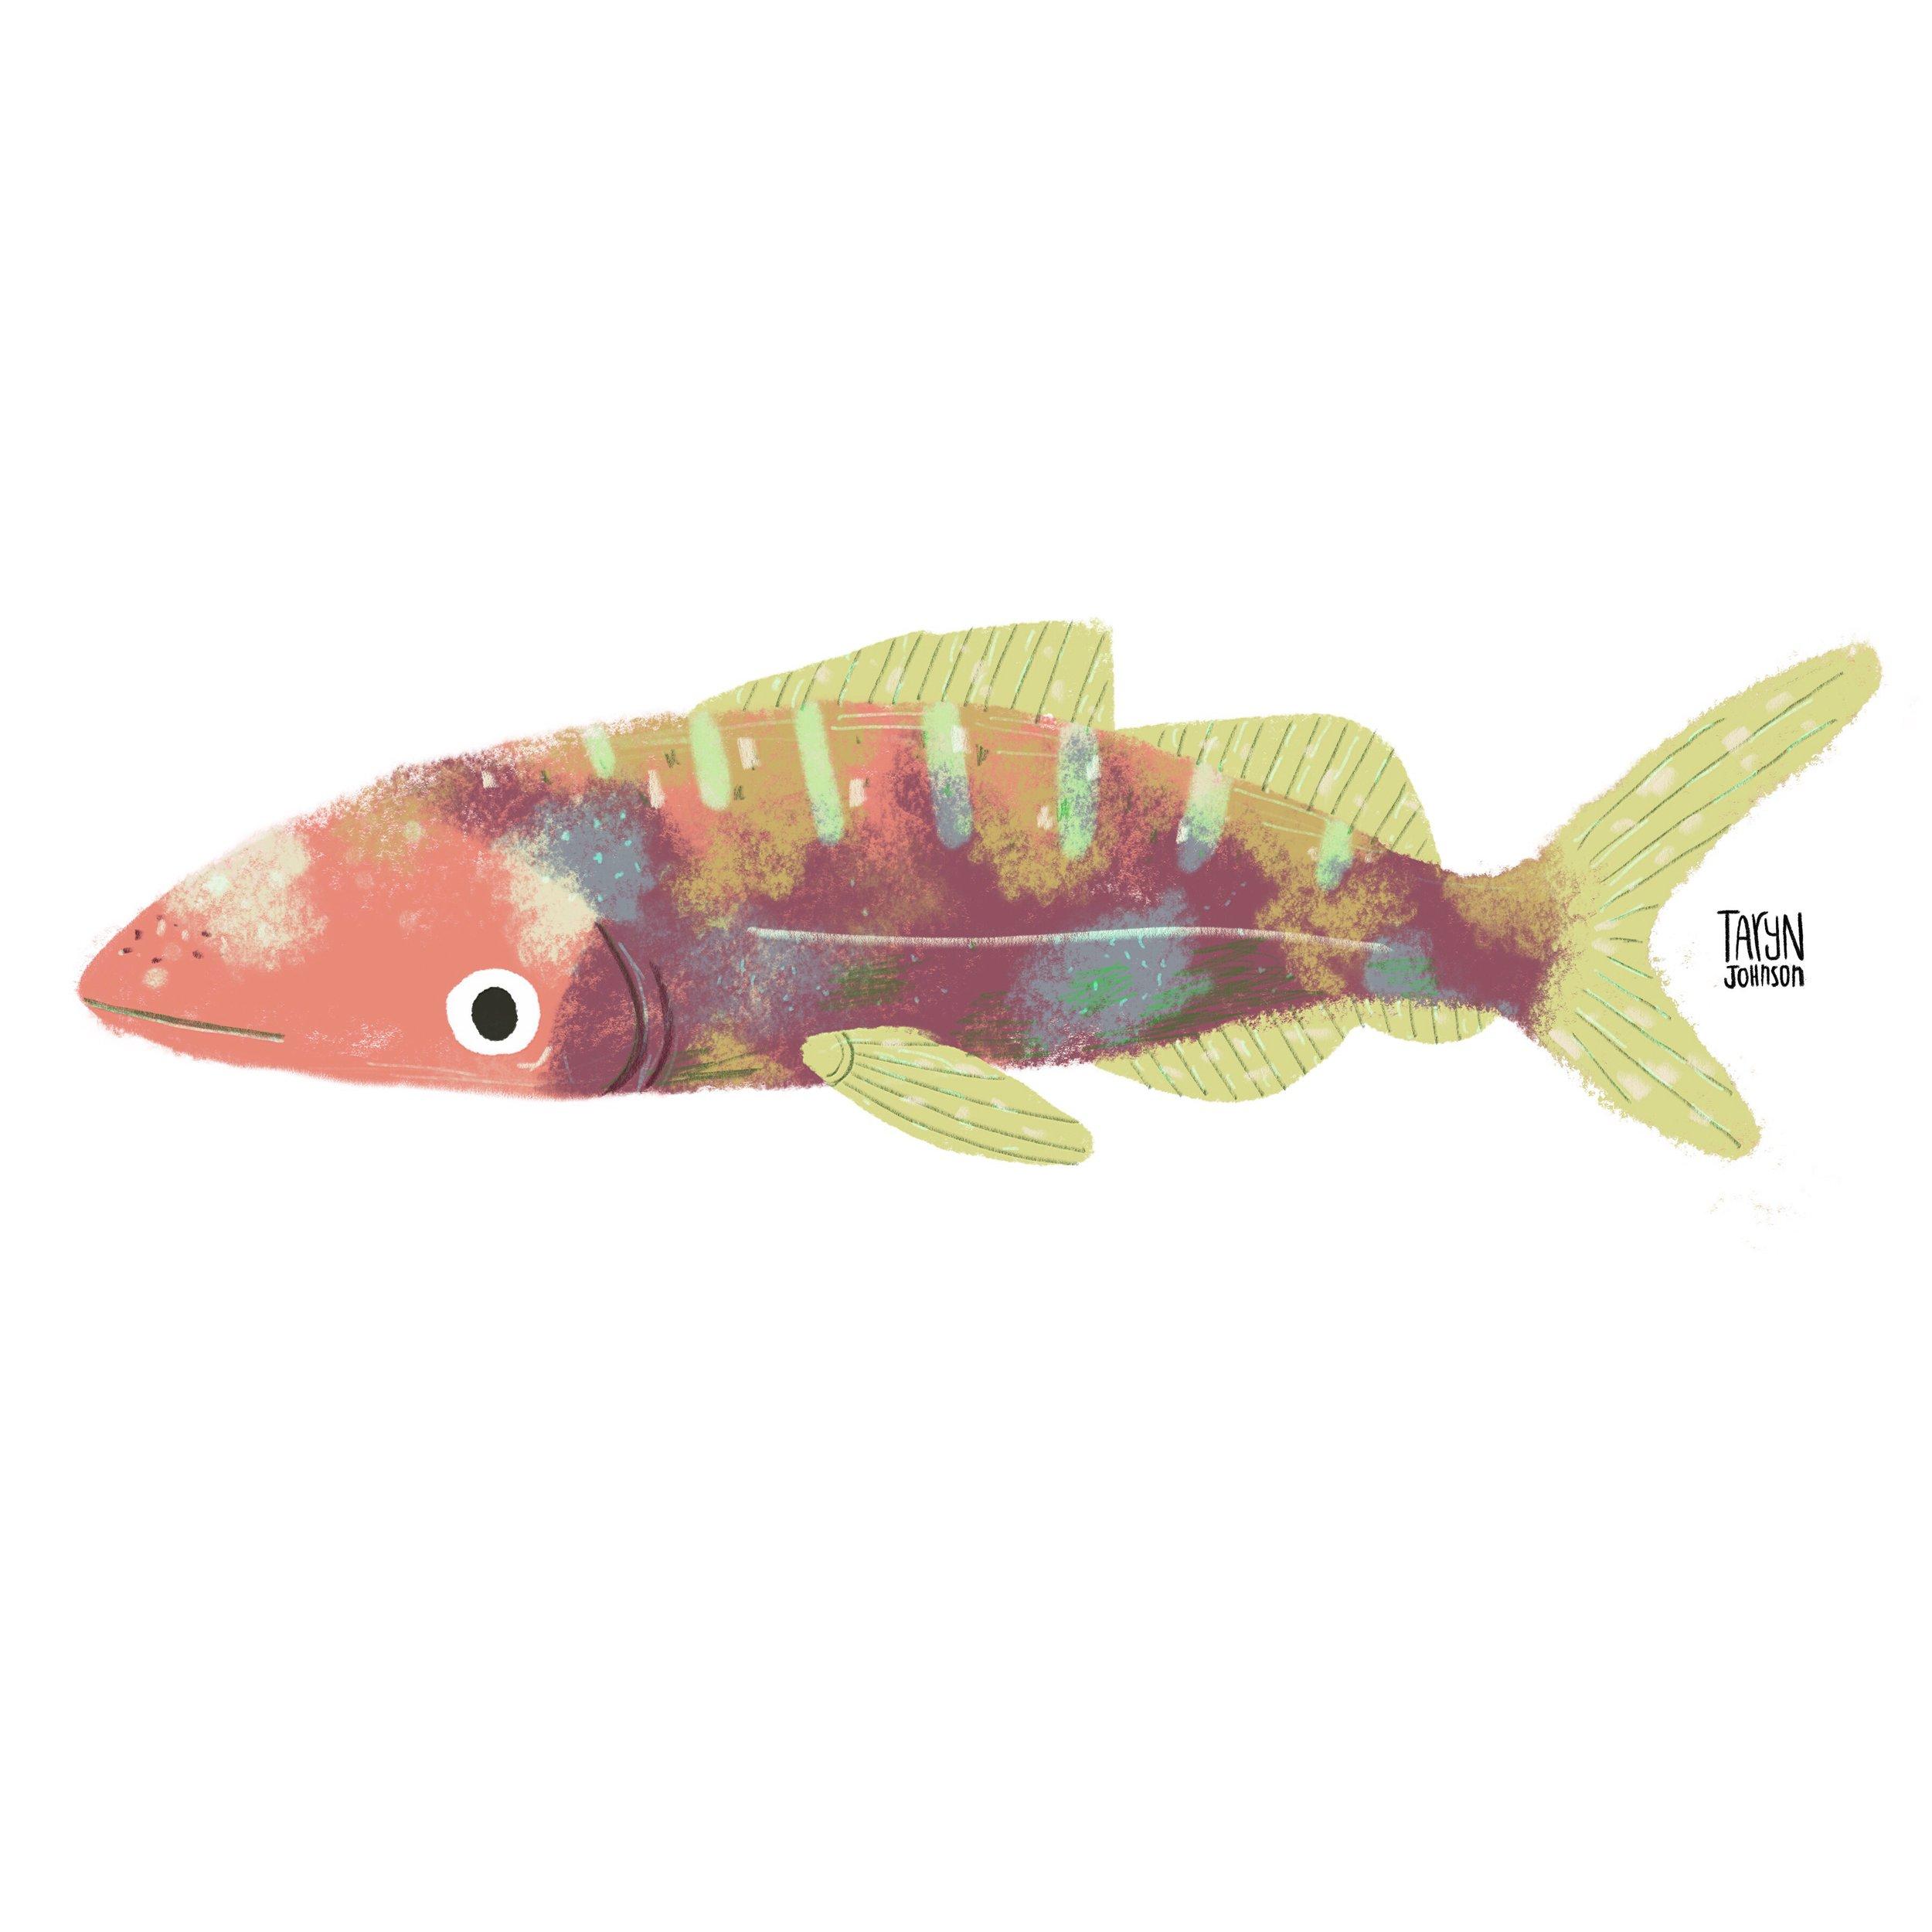 15/100 a soft fish